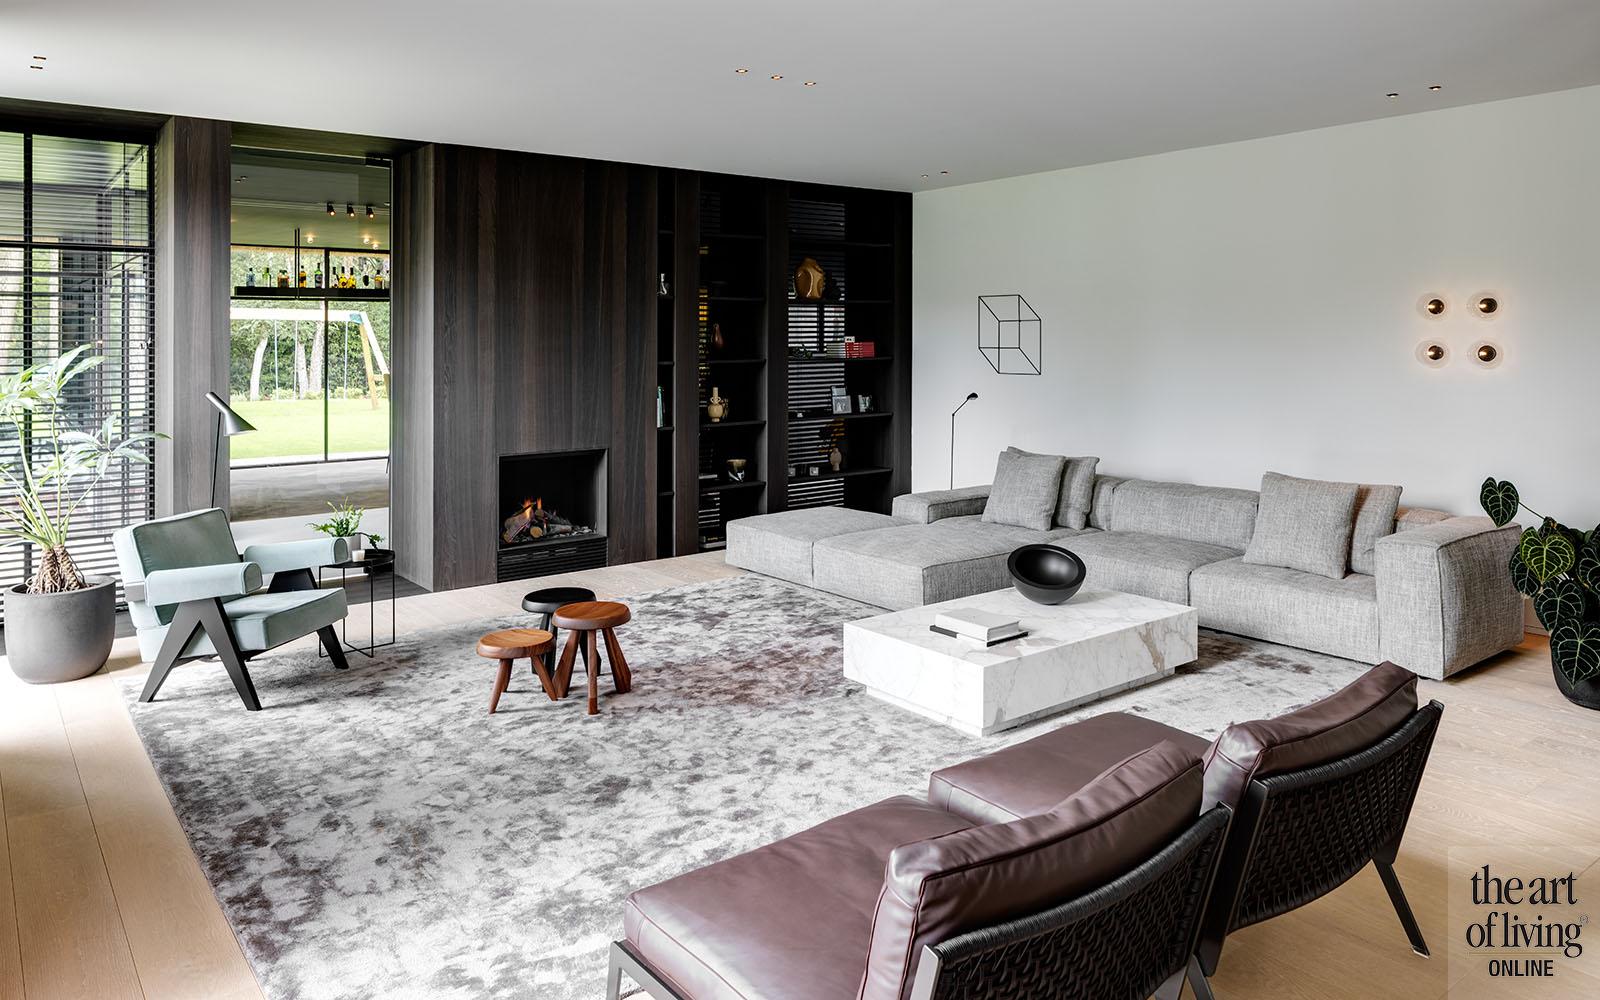 Droomvilla   Niels Maier, the art of living